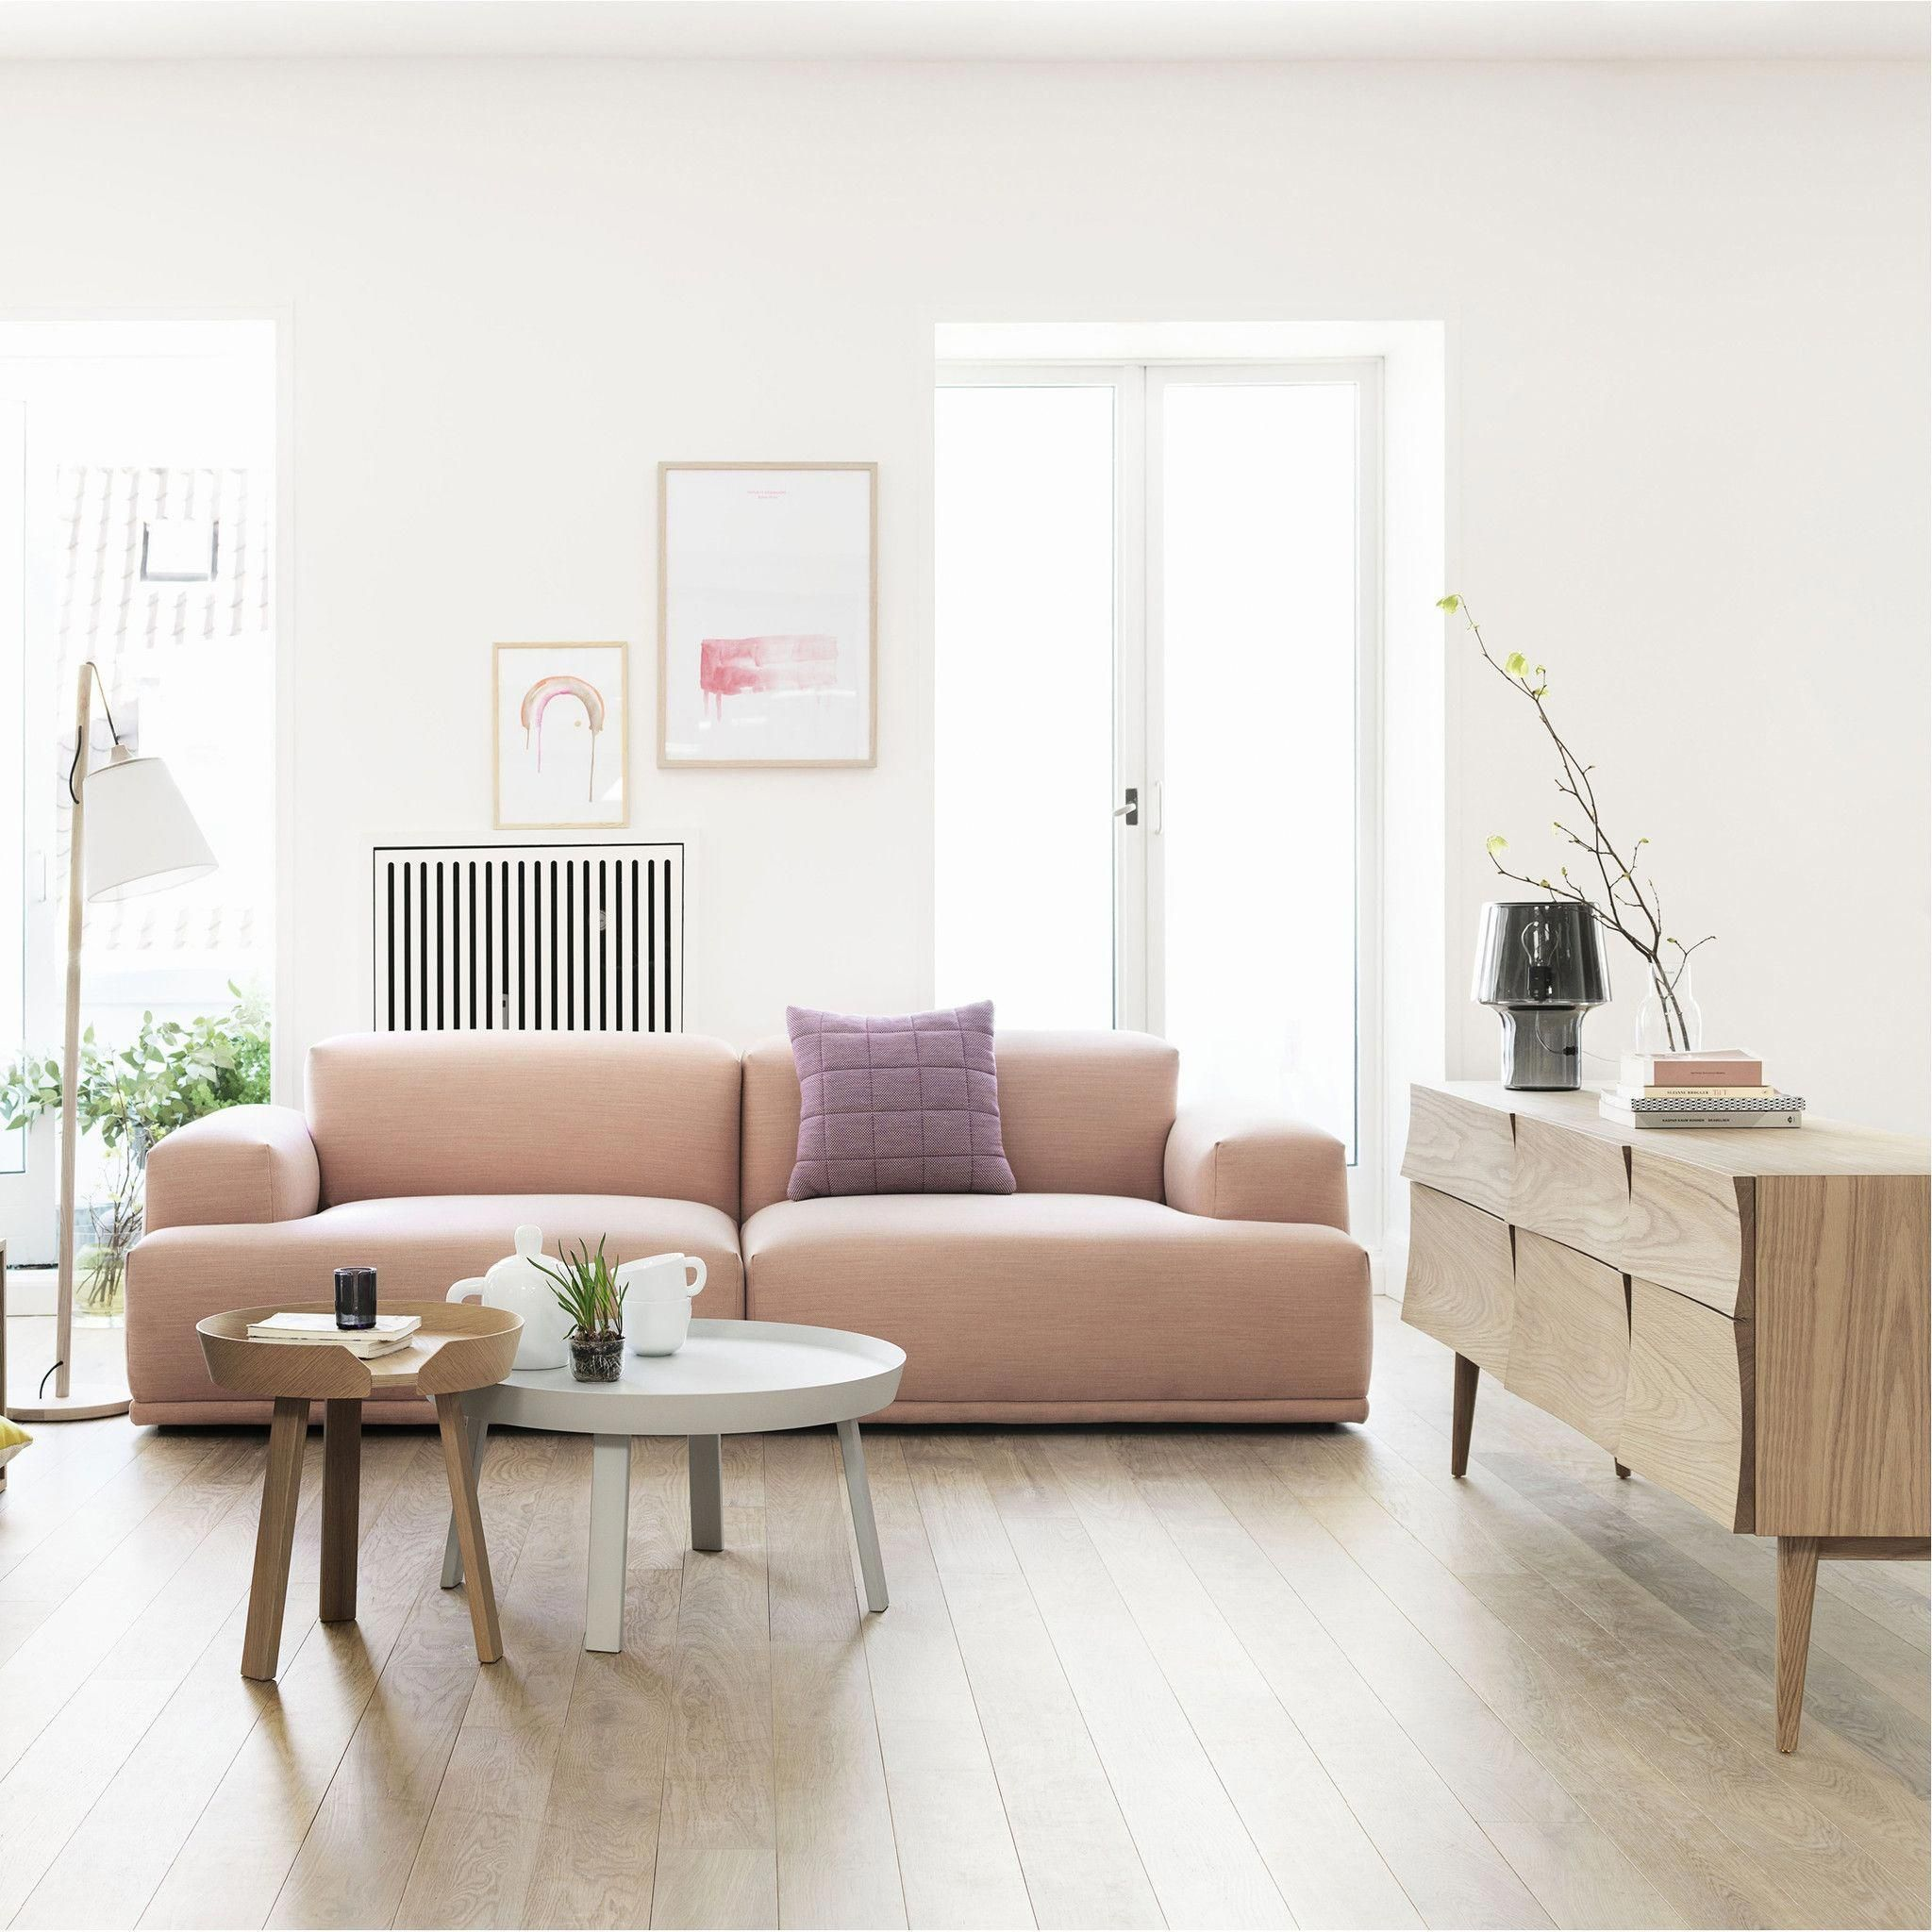 Living Room Designs, Modular Sofa